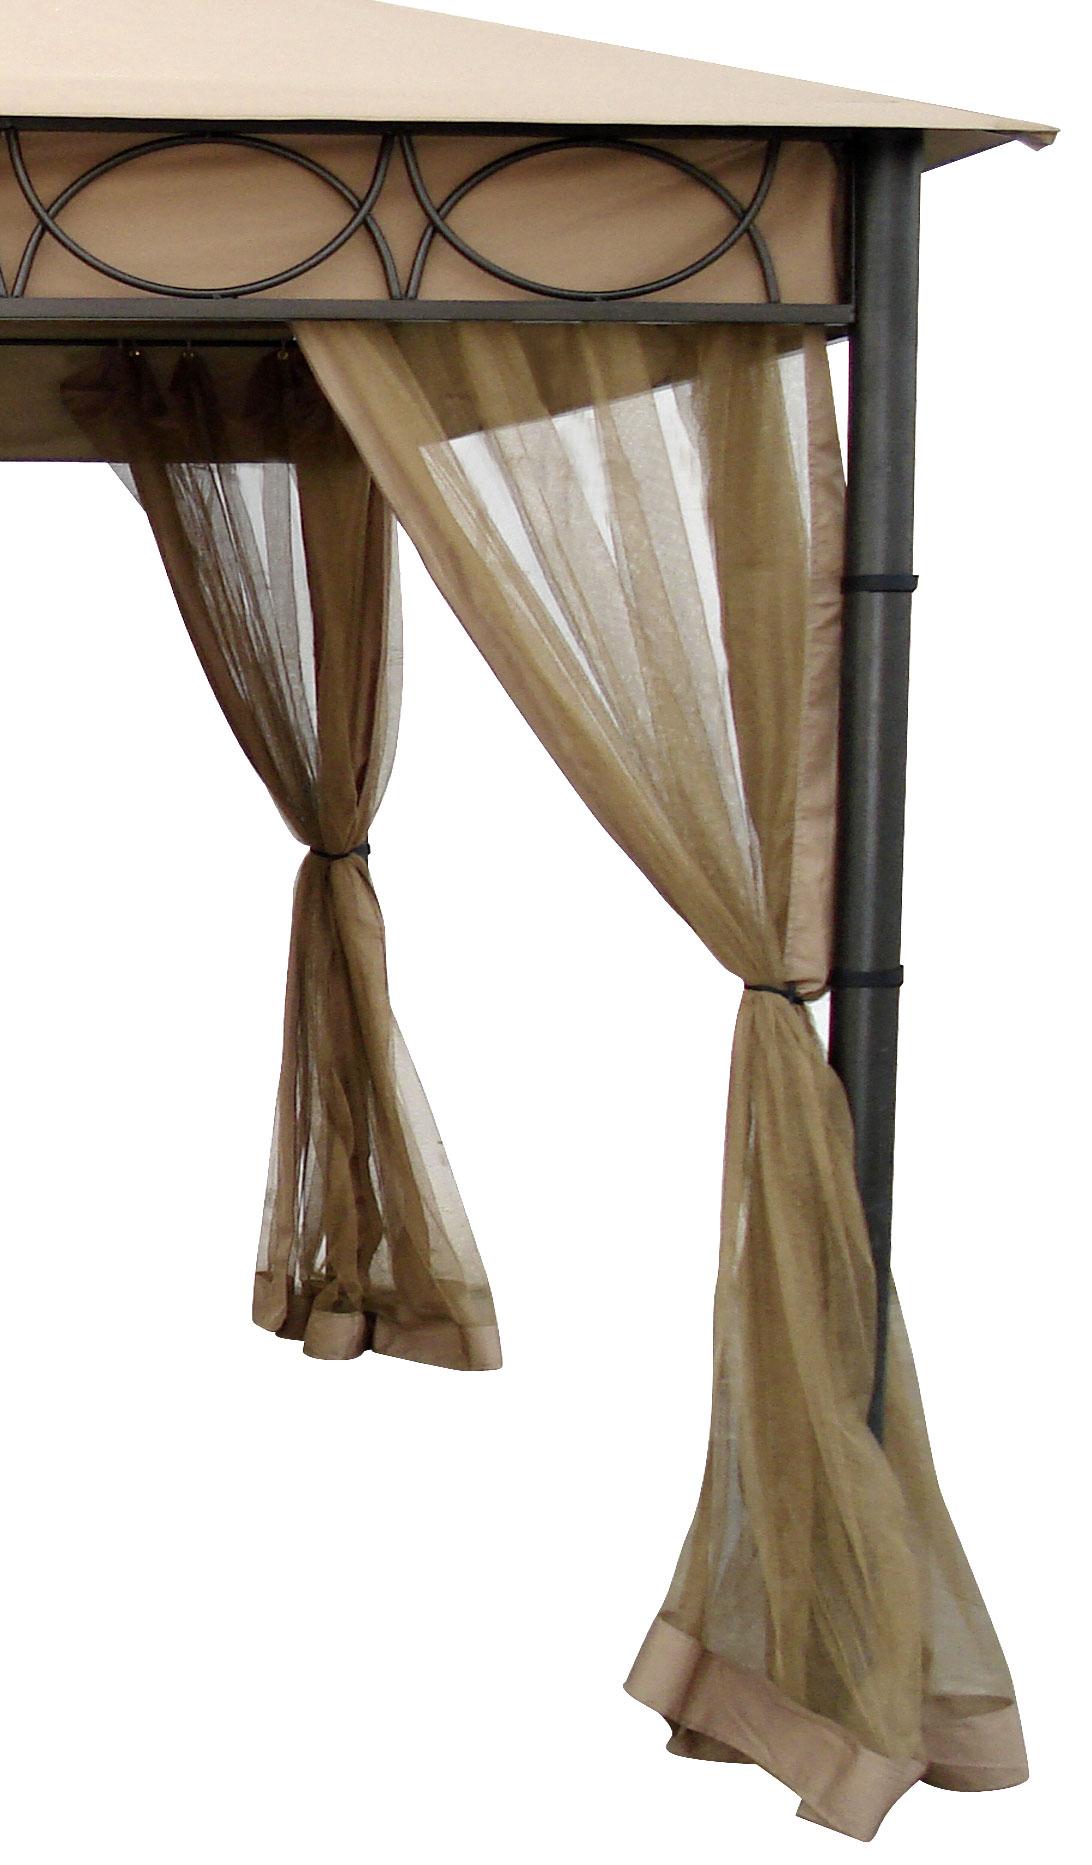 Moskitonetze für Luxus-Metallpavillon Bellavista 350x350cm 4 Stück Bild 1